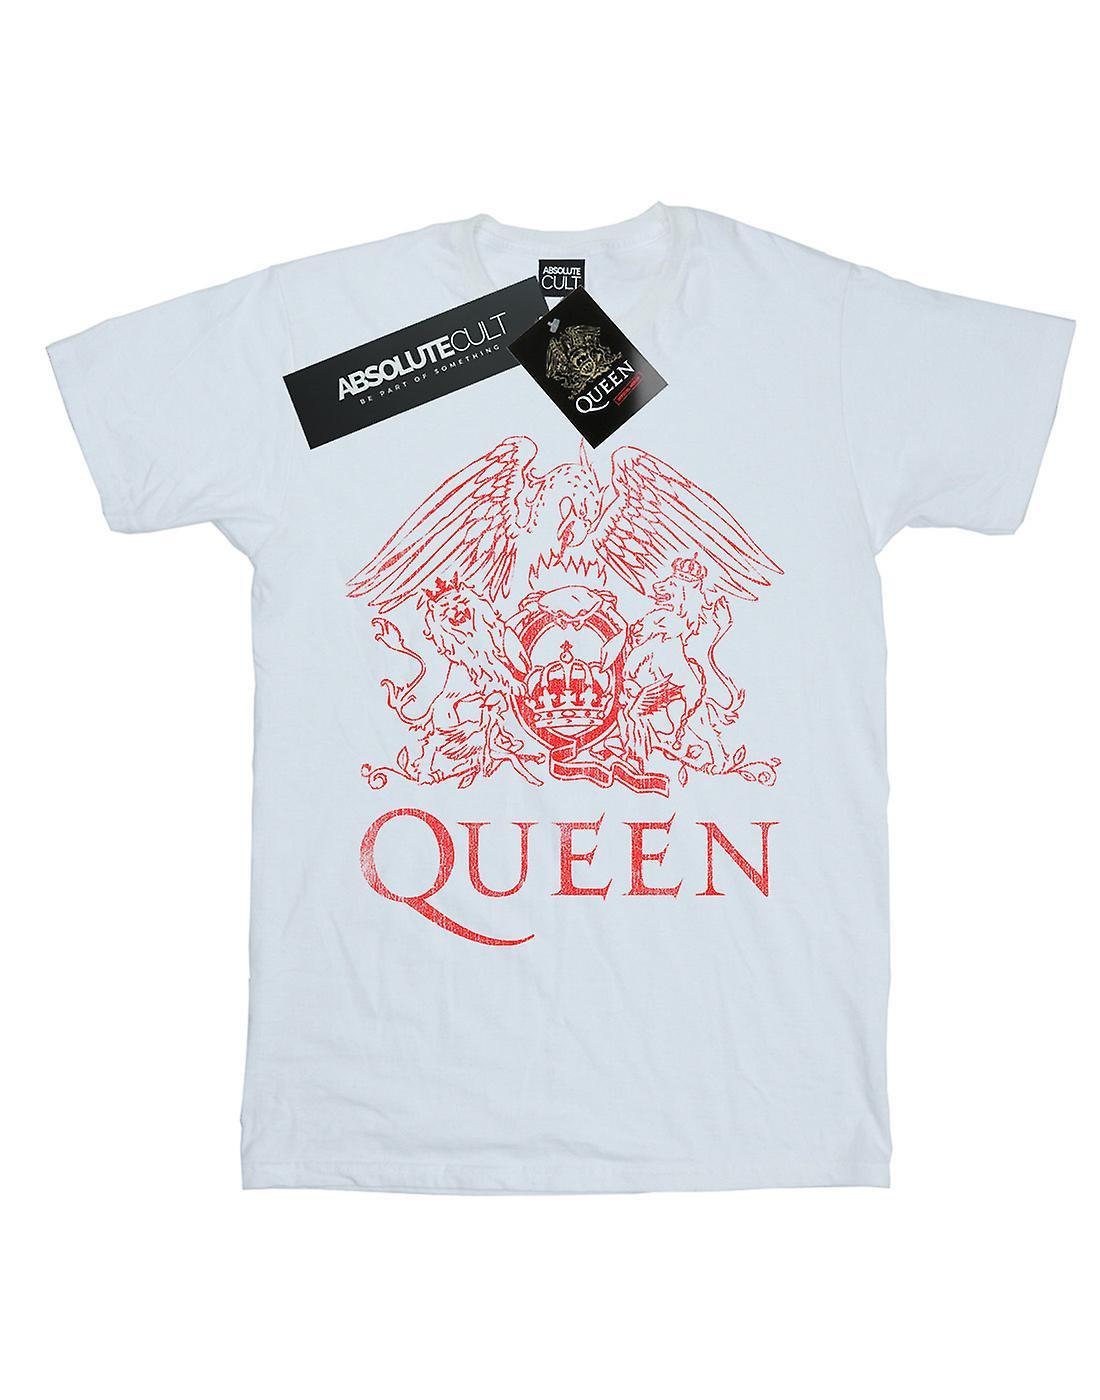 Queen Boys Distressed Crest T-Shirt